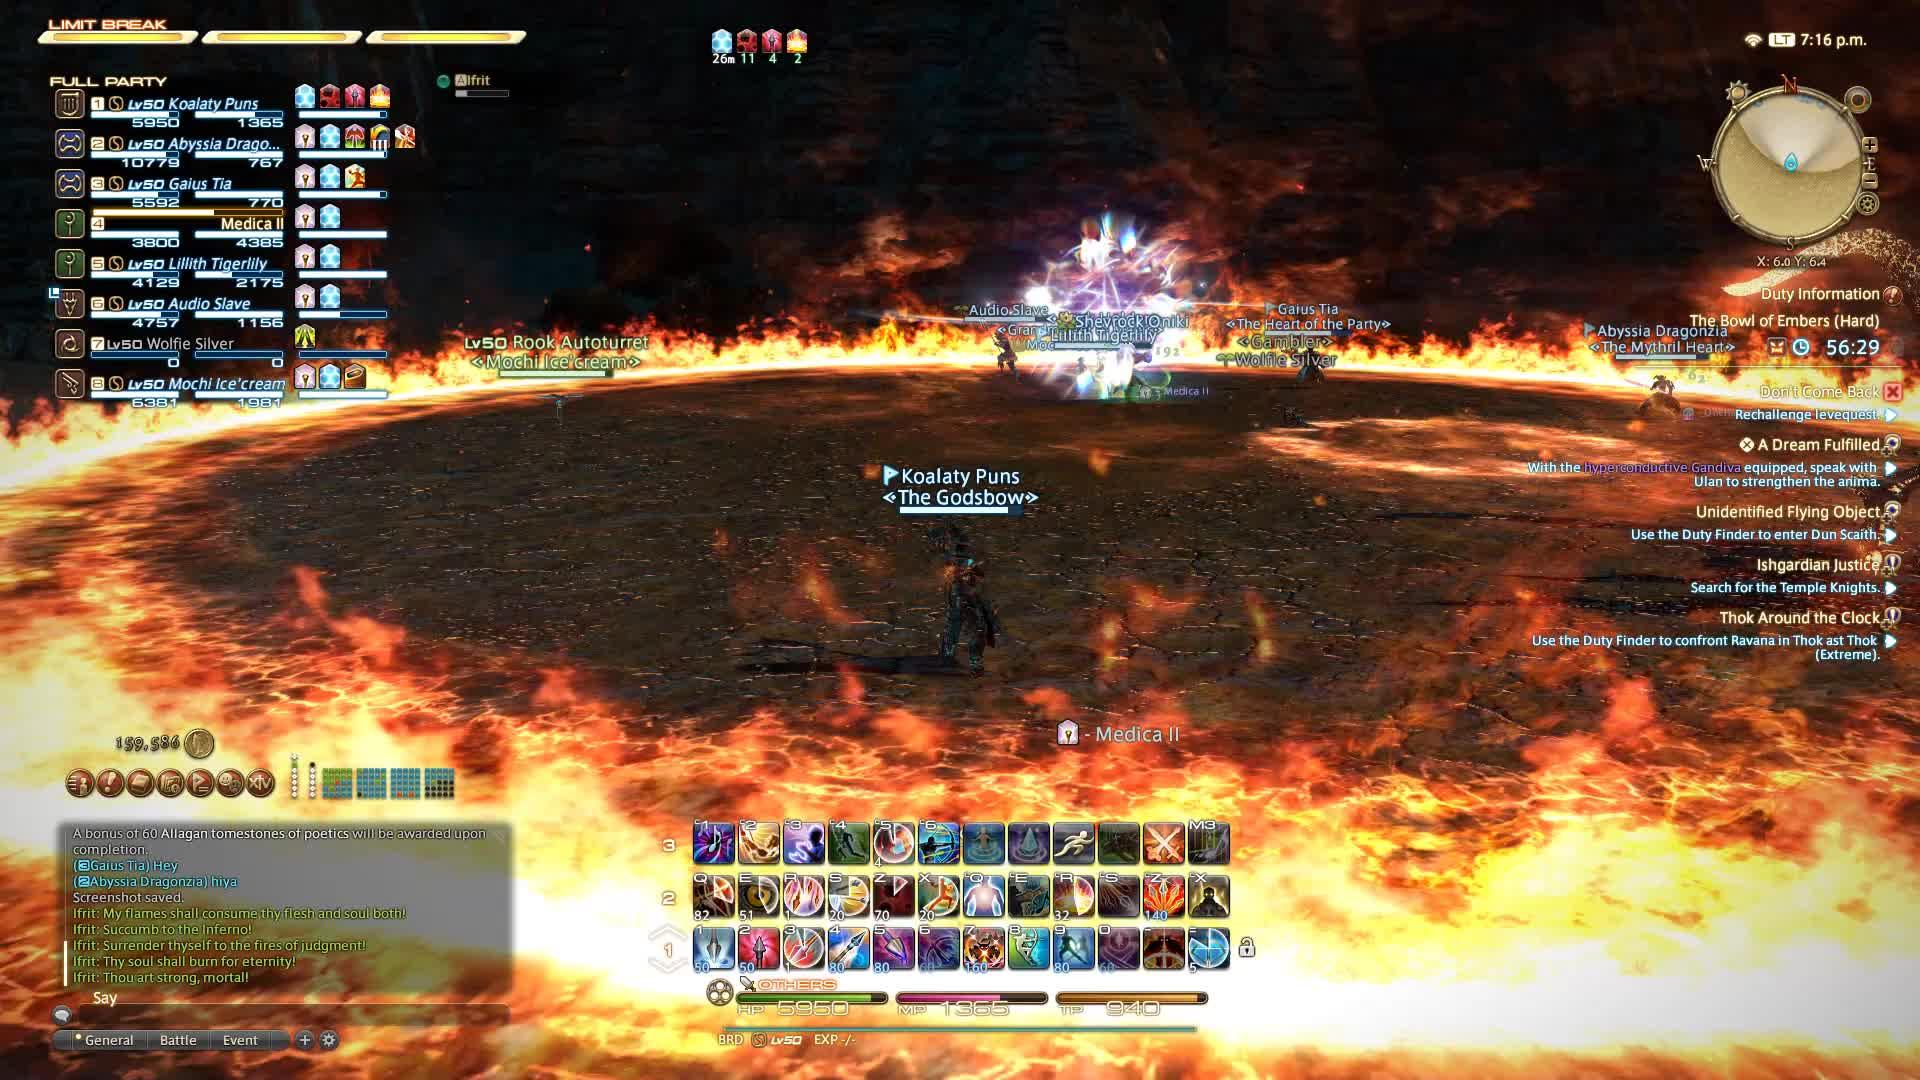 Final Fantasy XIV A Realm Reborn 05 13 2017 19 16 32 02